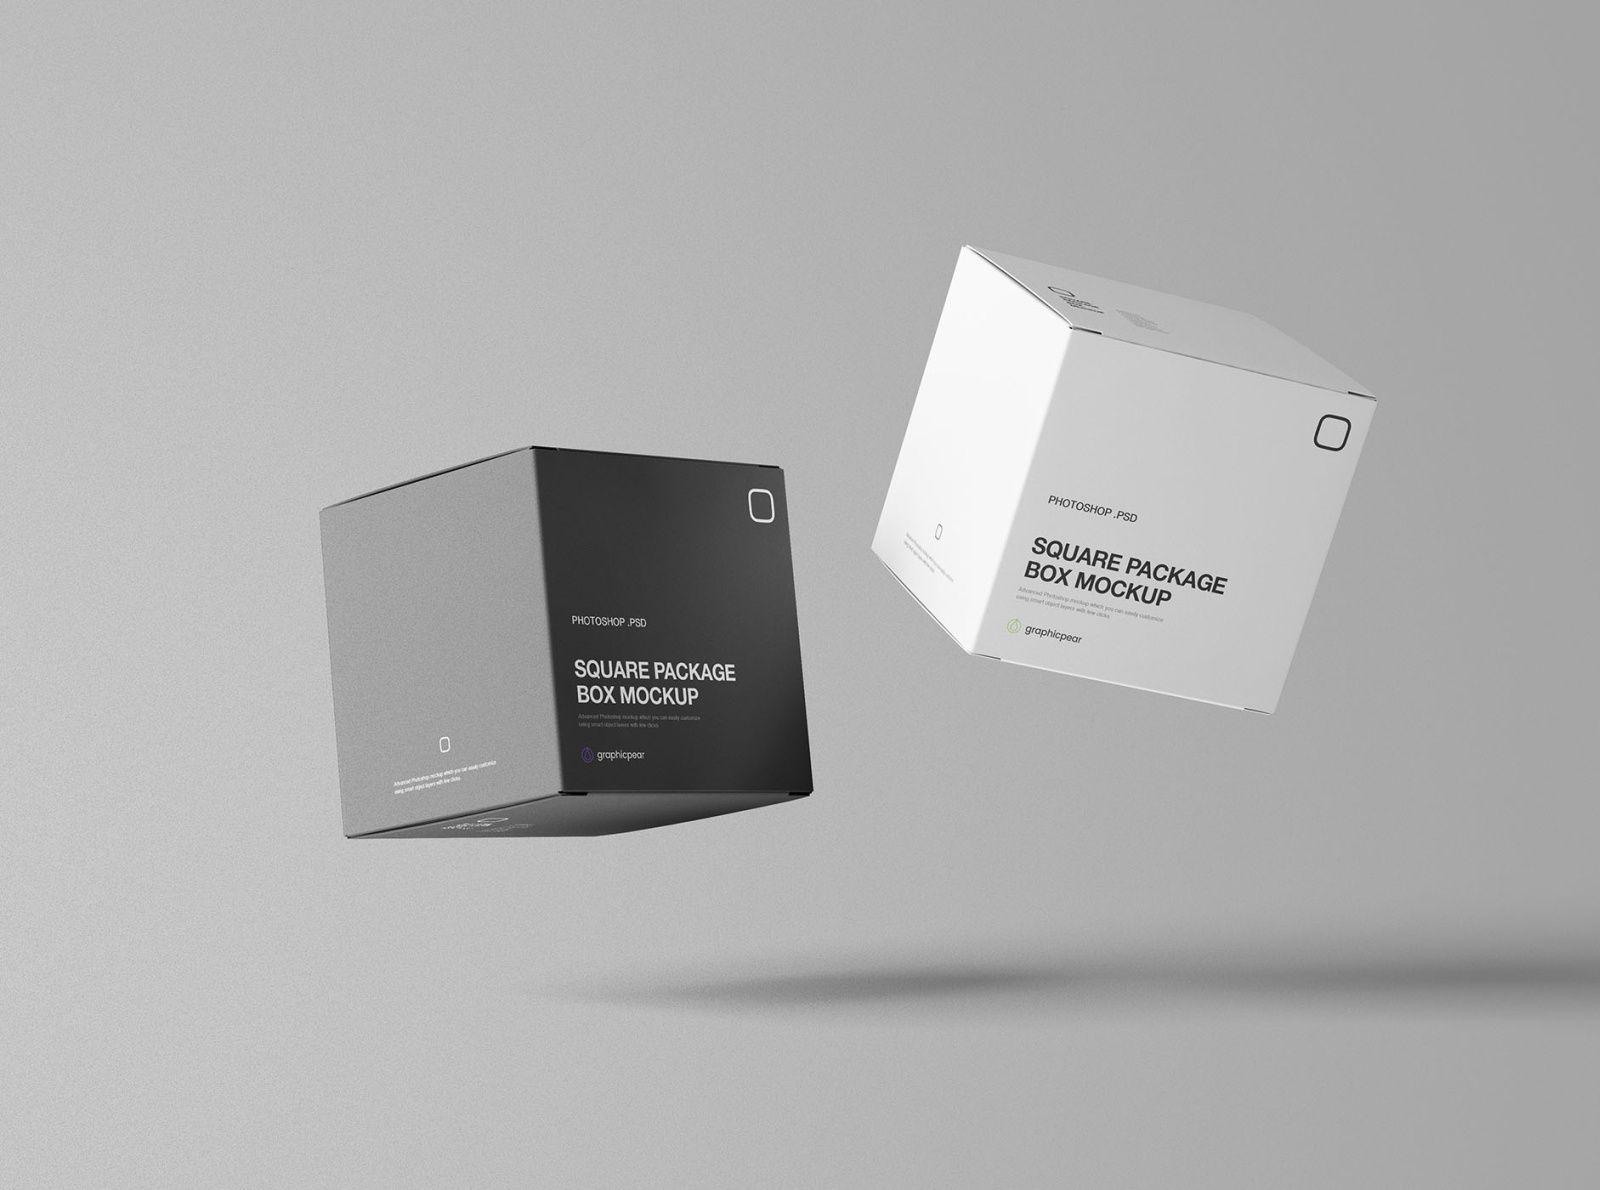 Square Package Box Mockup In 2021 Box Mockup Box Packaging Mockup